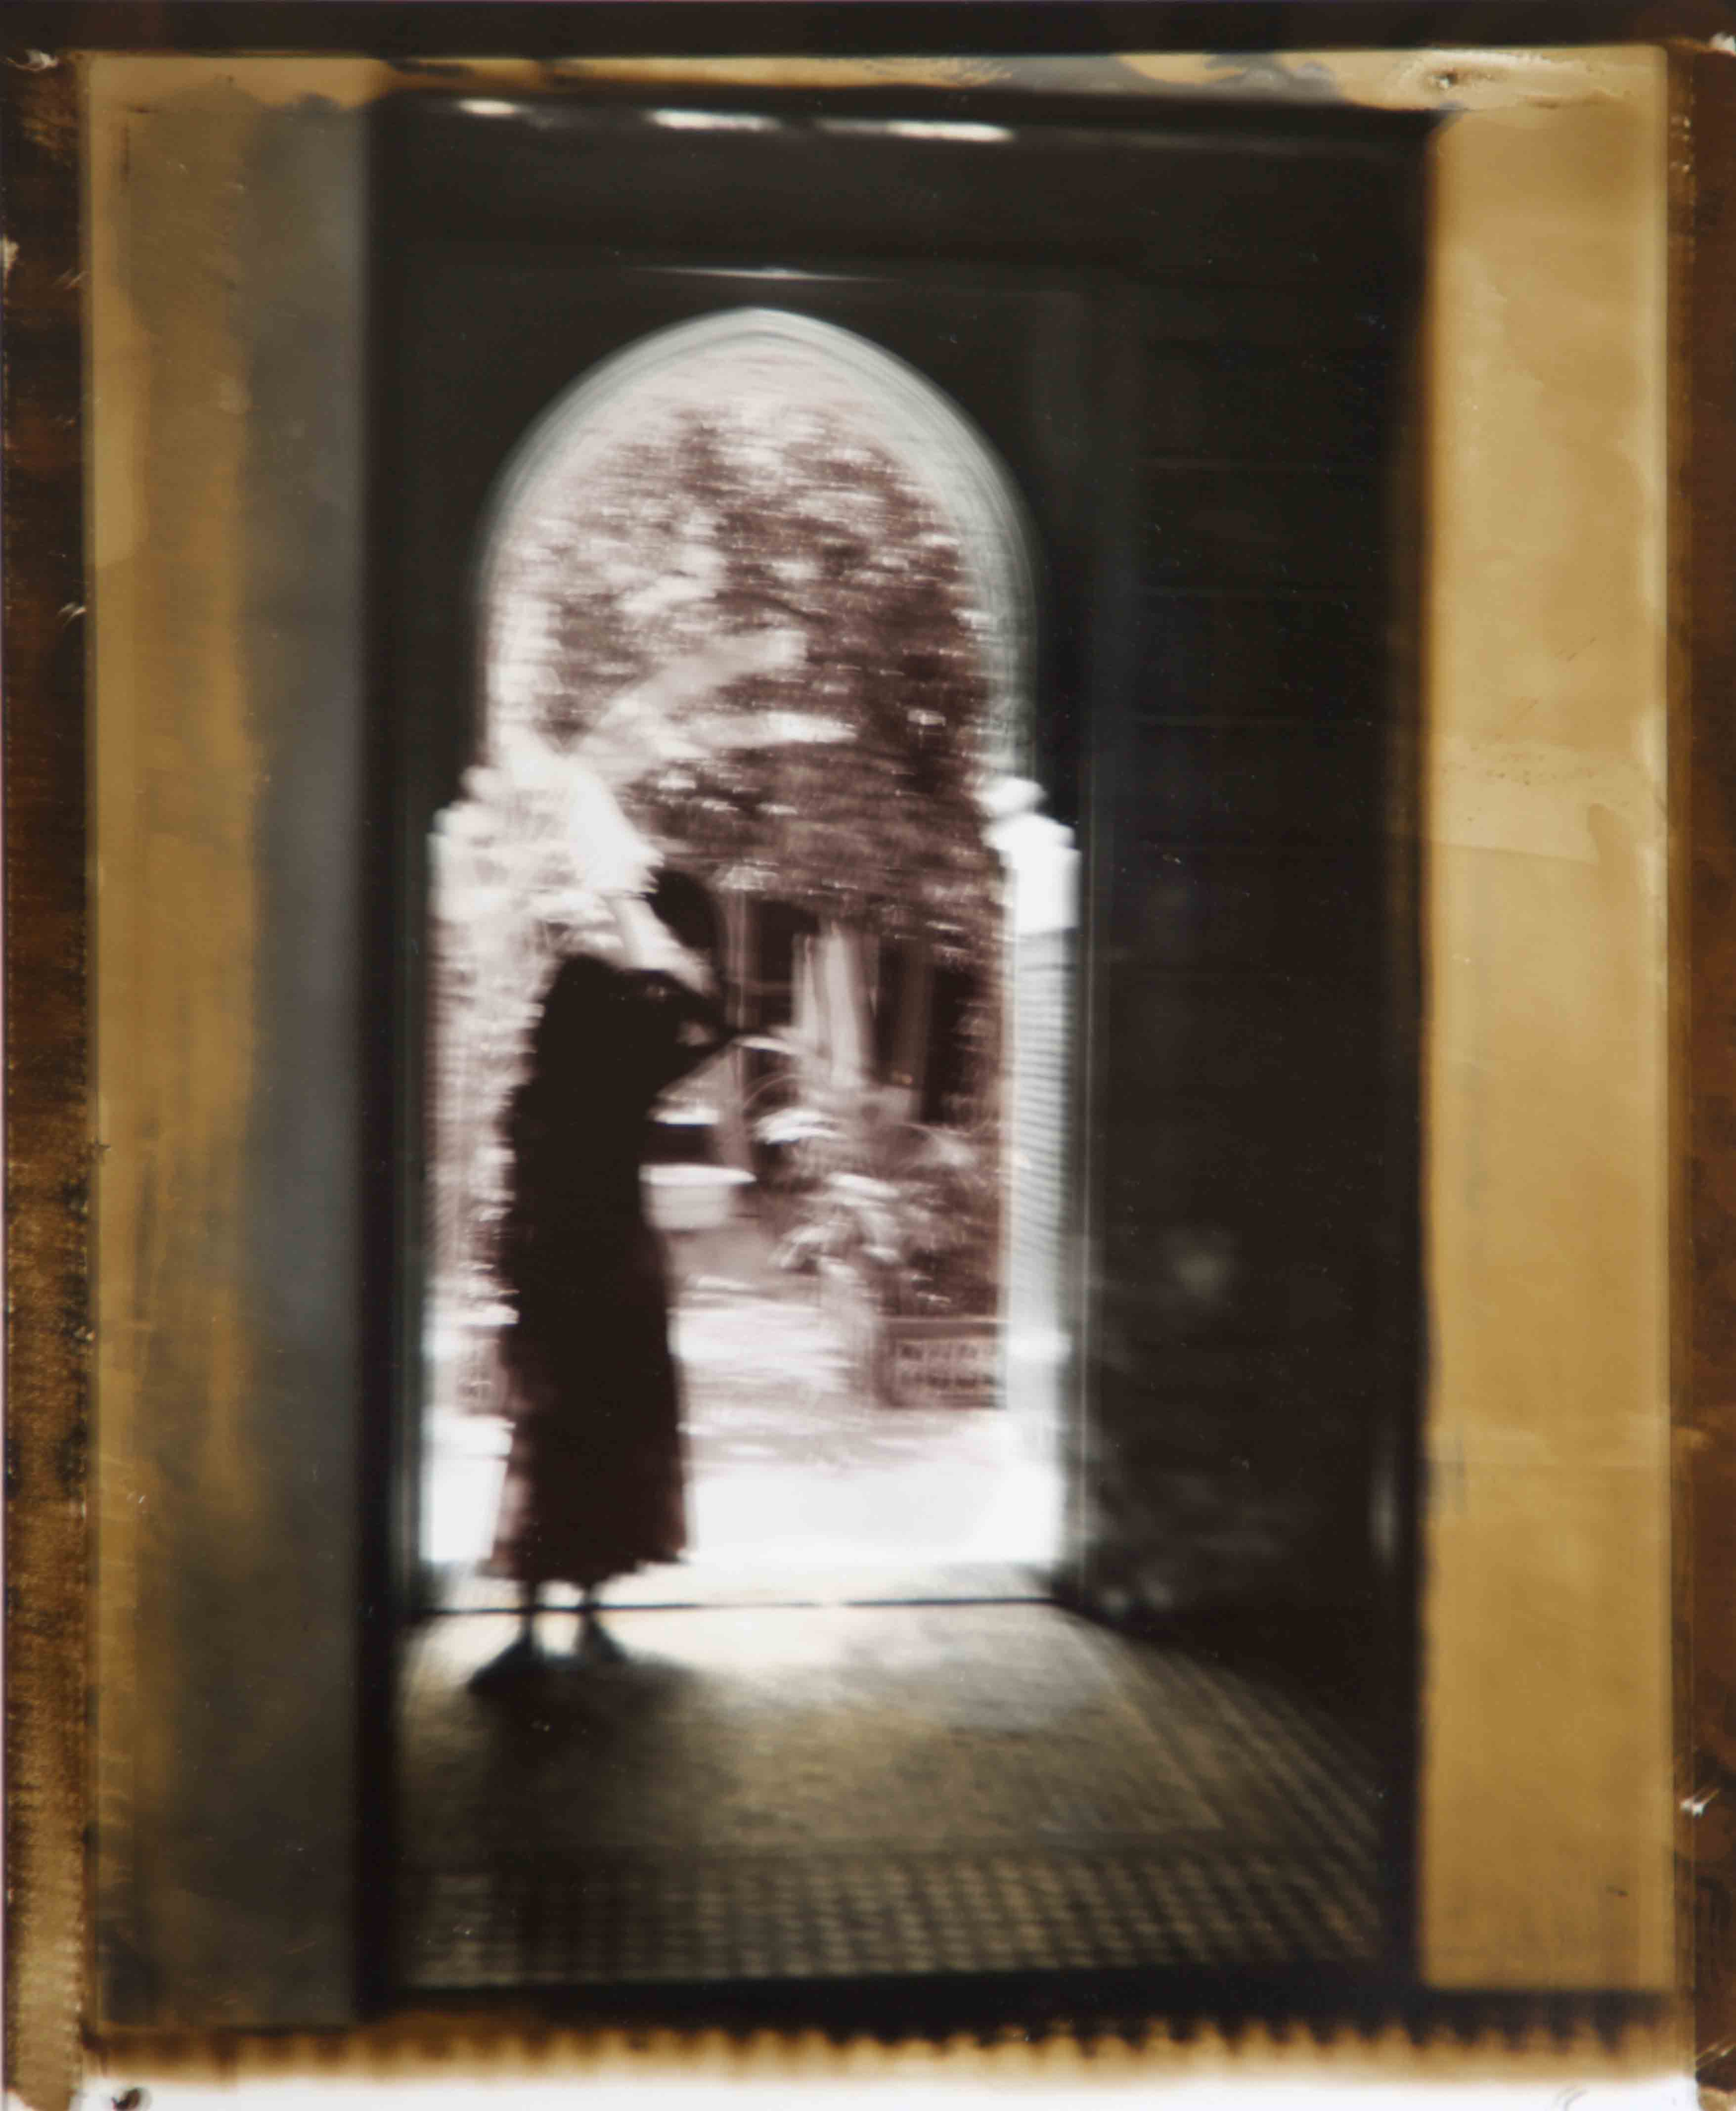 Jeune femme au riad, 2000<br/>Impresión de tintas de pigmentos / Inkjet